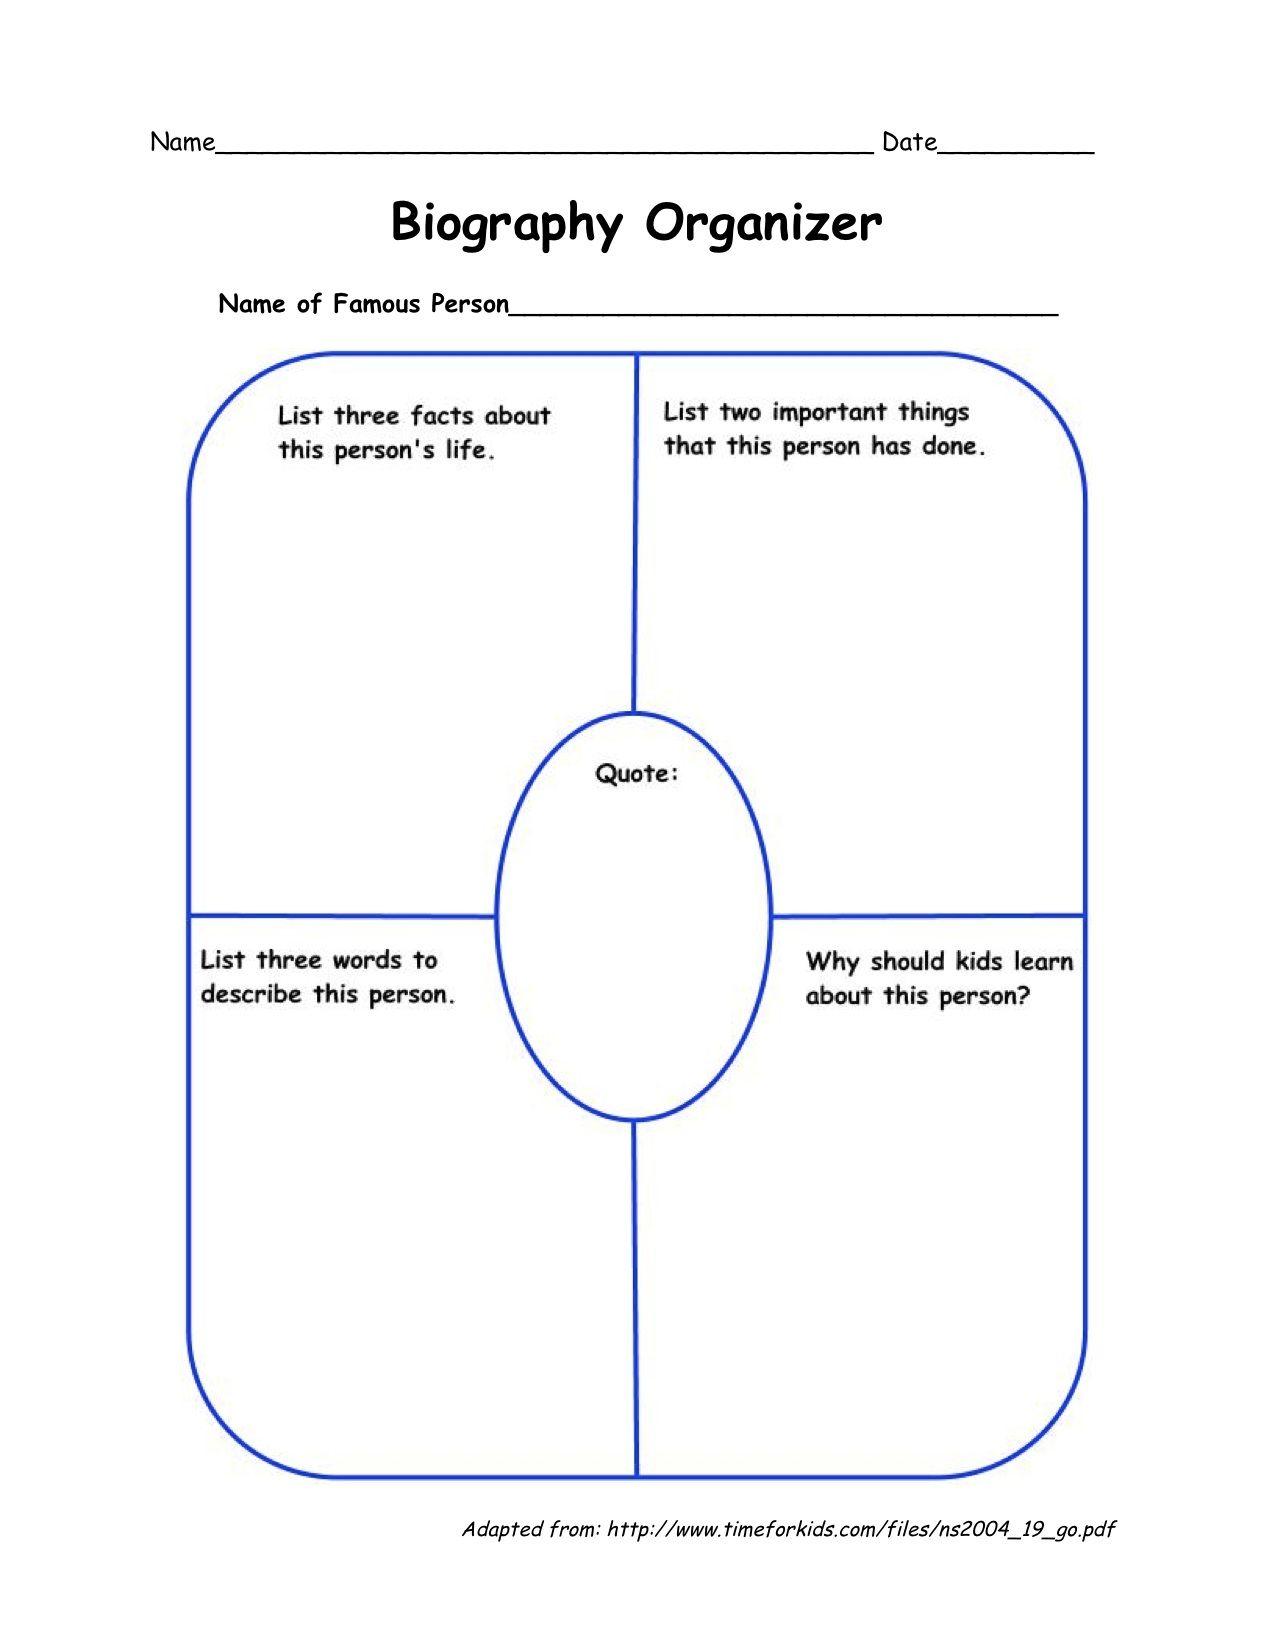 templatebiographyorganizer-1.jpg (1275×1651)   Second grade writing [ 1651 x 1275 Pixel ]